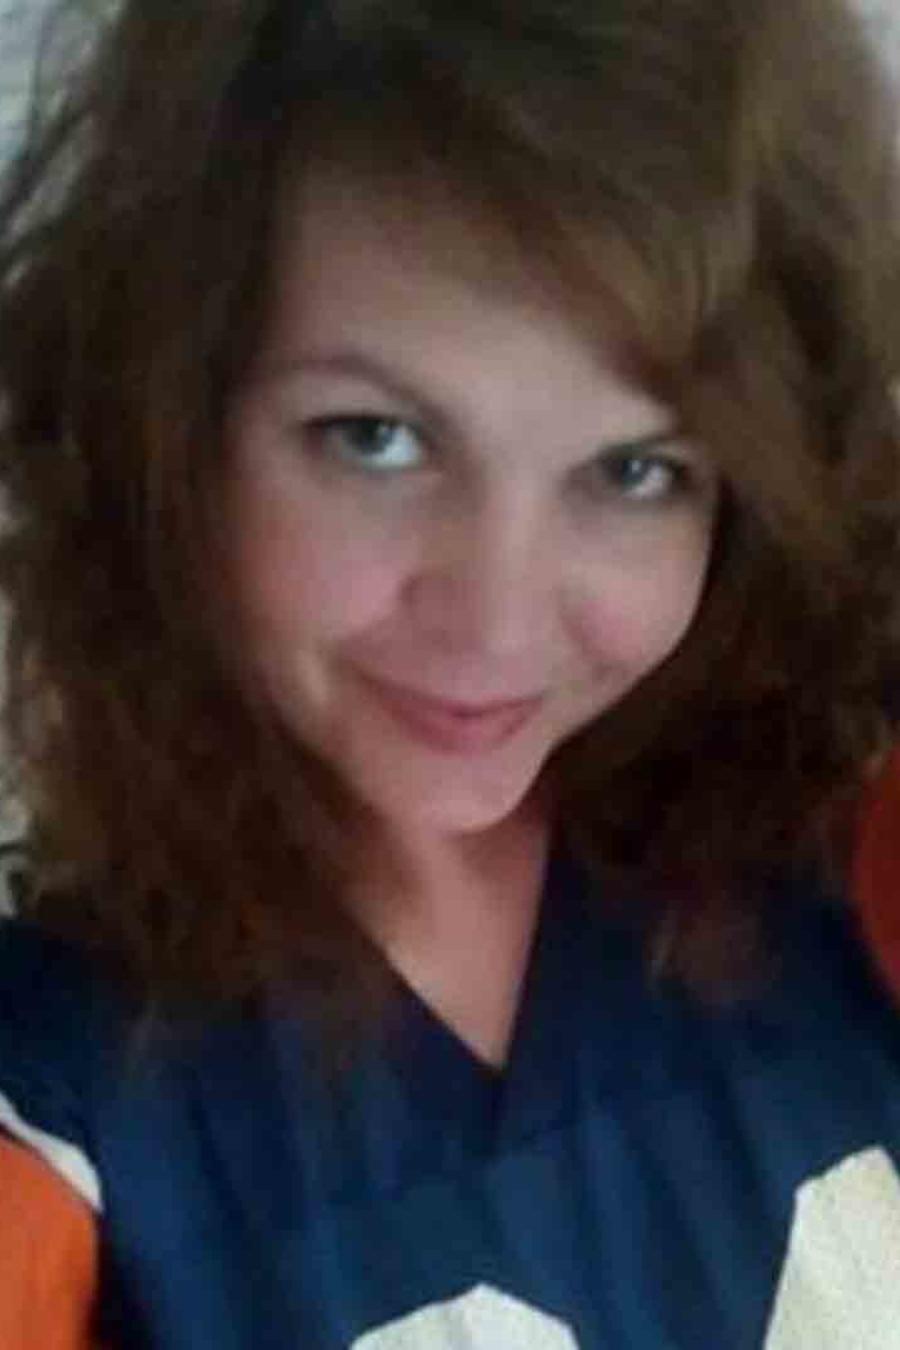 Madre e hija murieron en accidentes separados